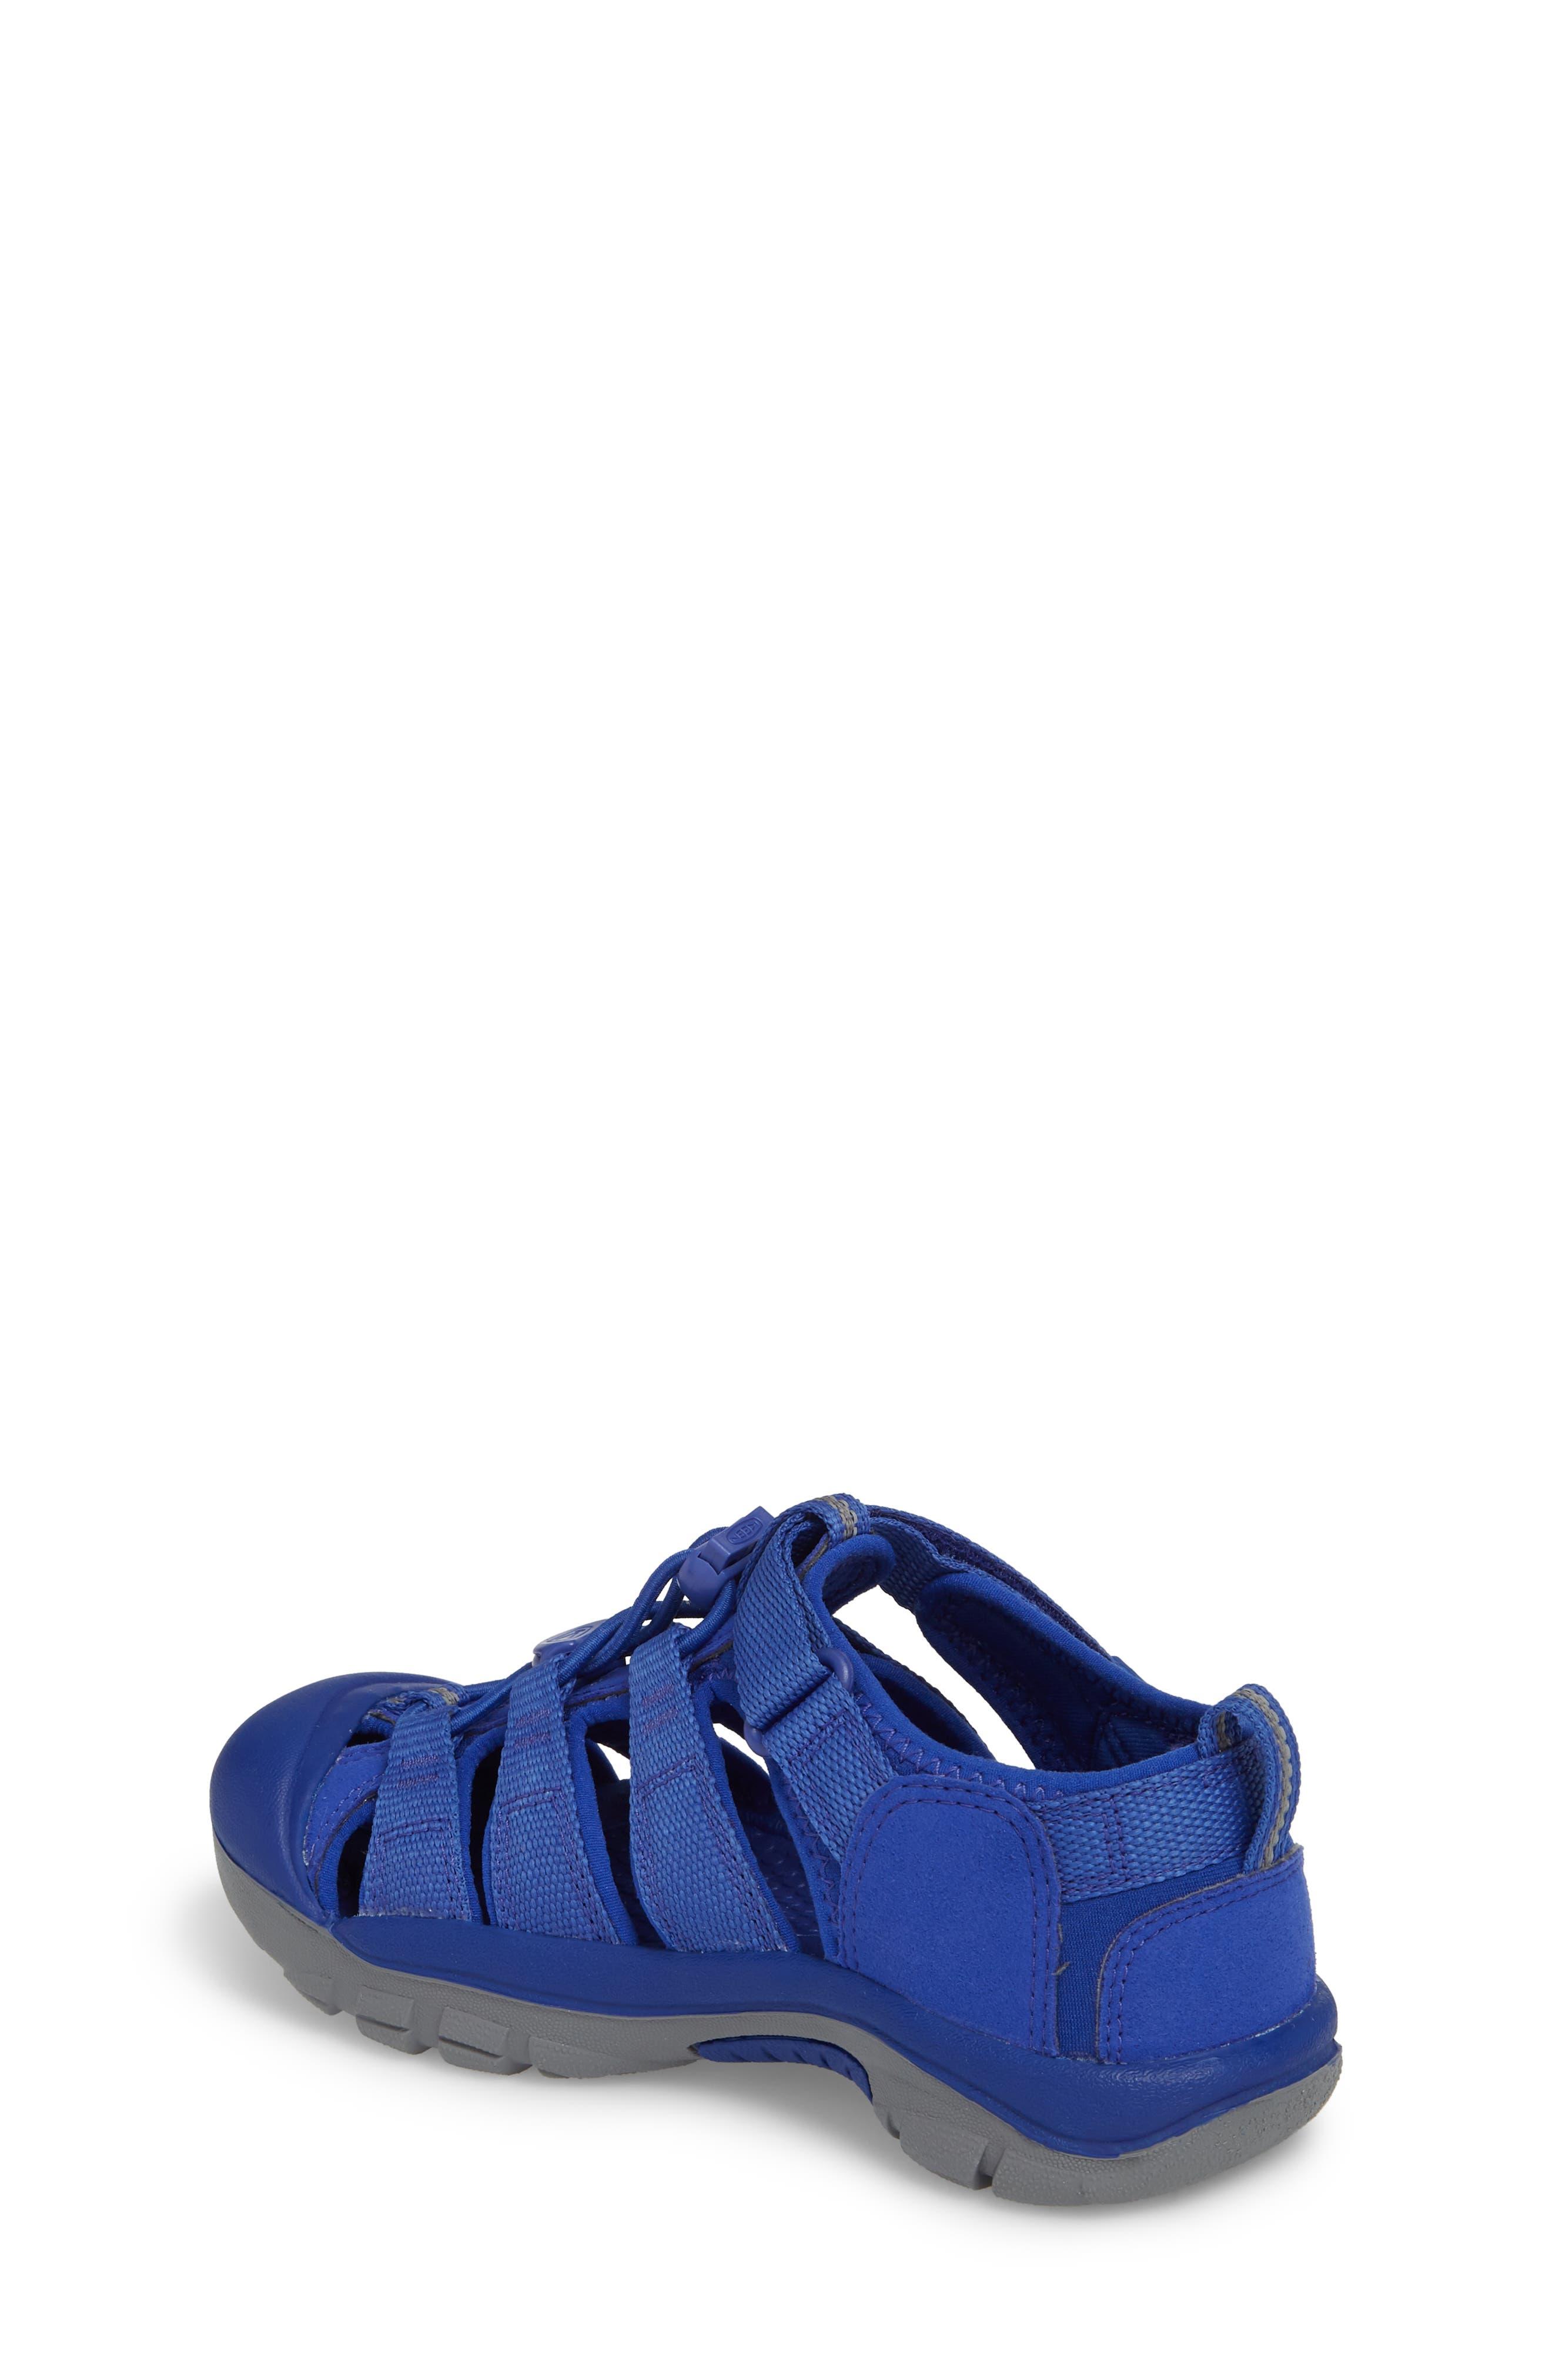 'Newport H2' Water Friendly Sandal,                             Alternate thumbnail 62, color,